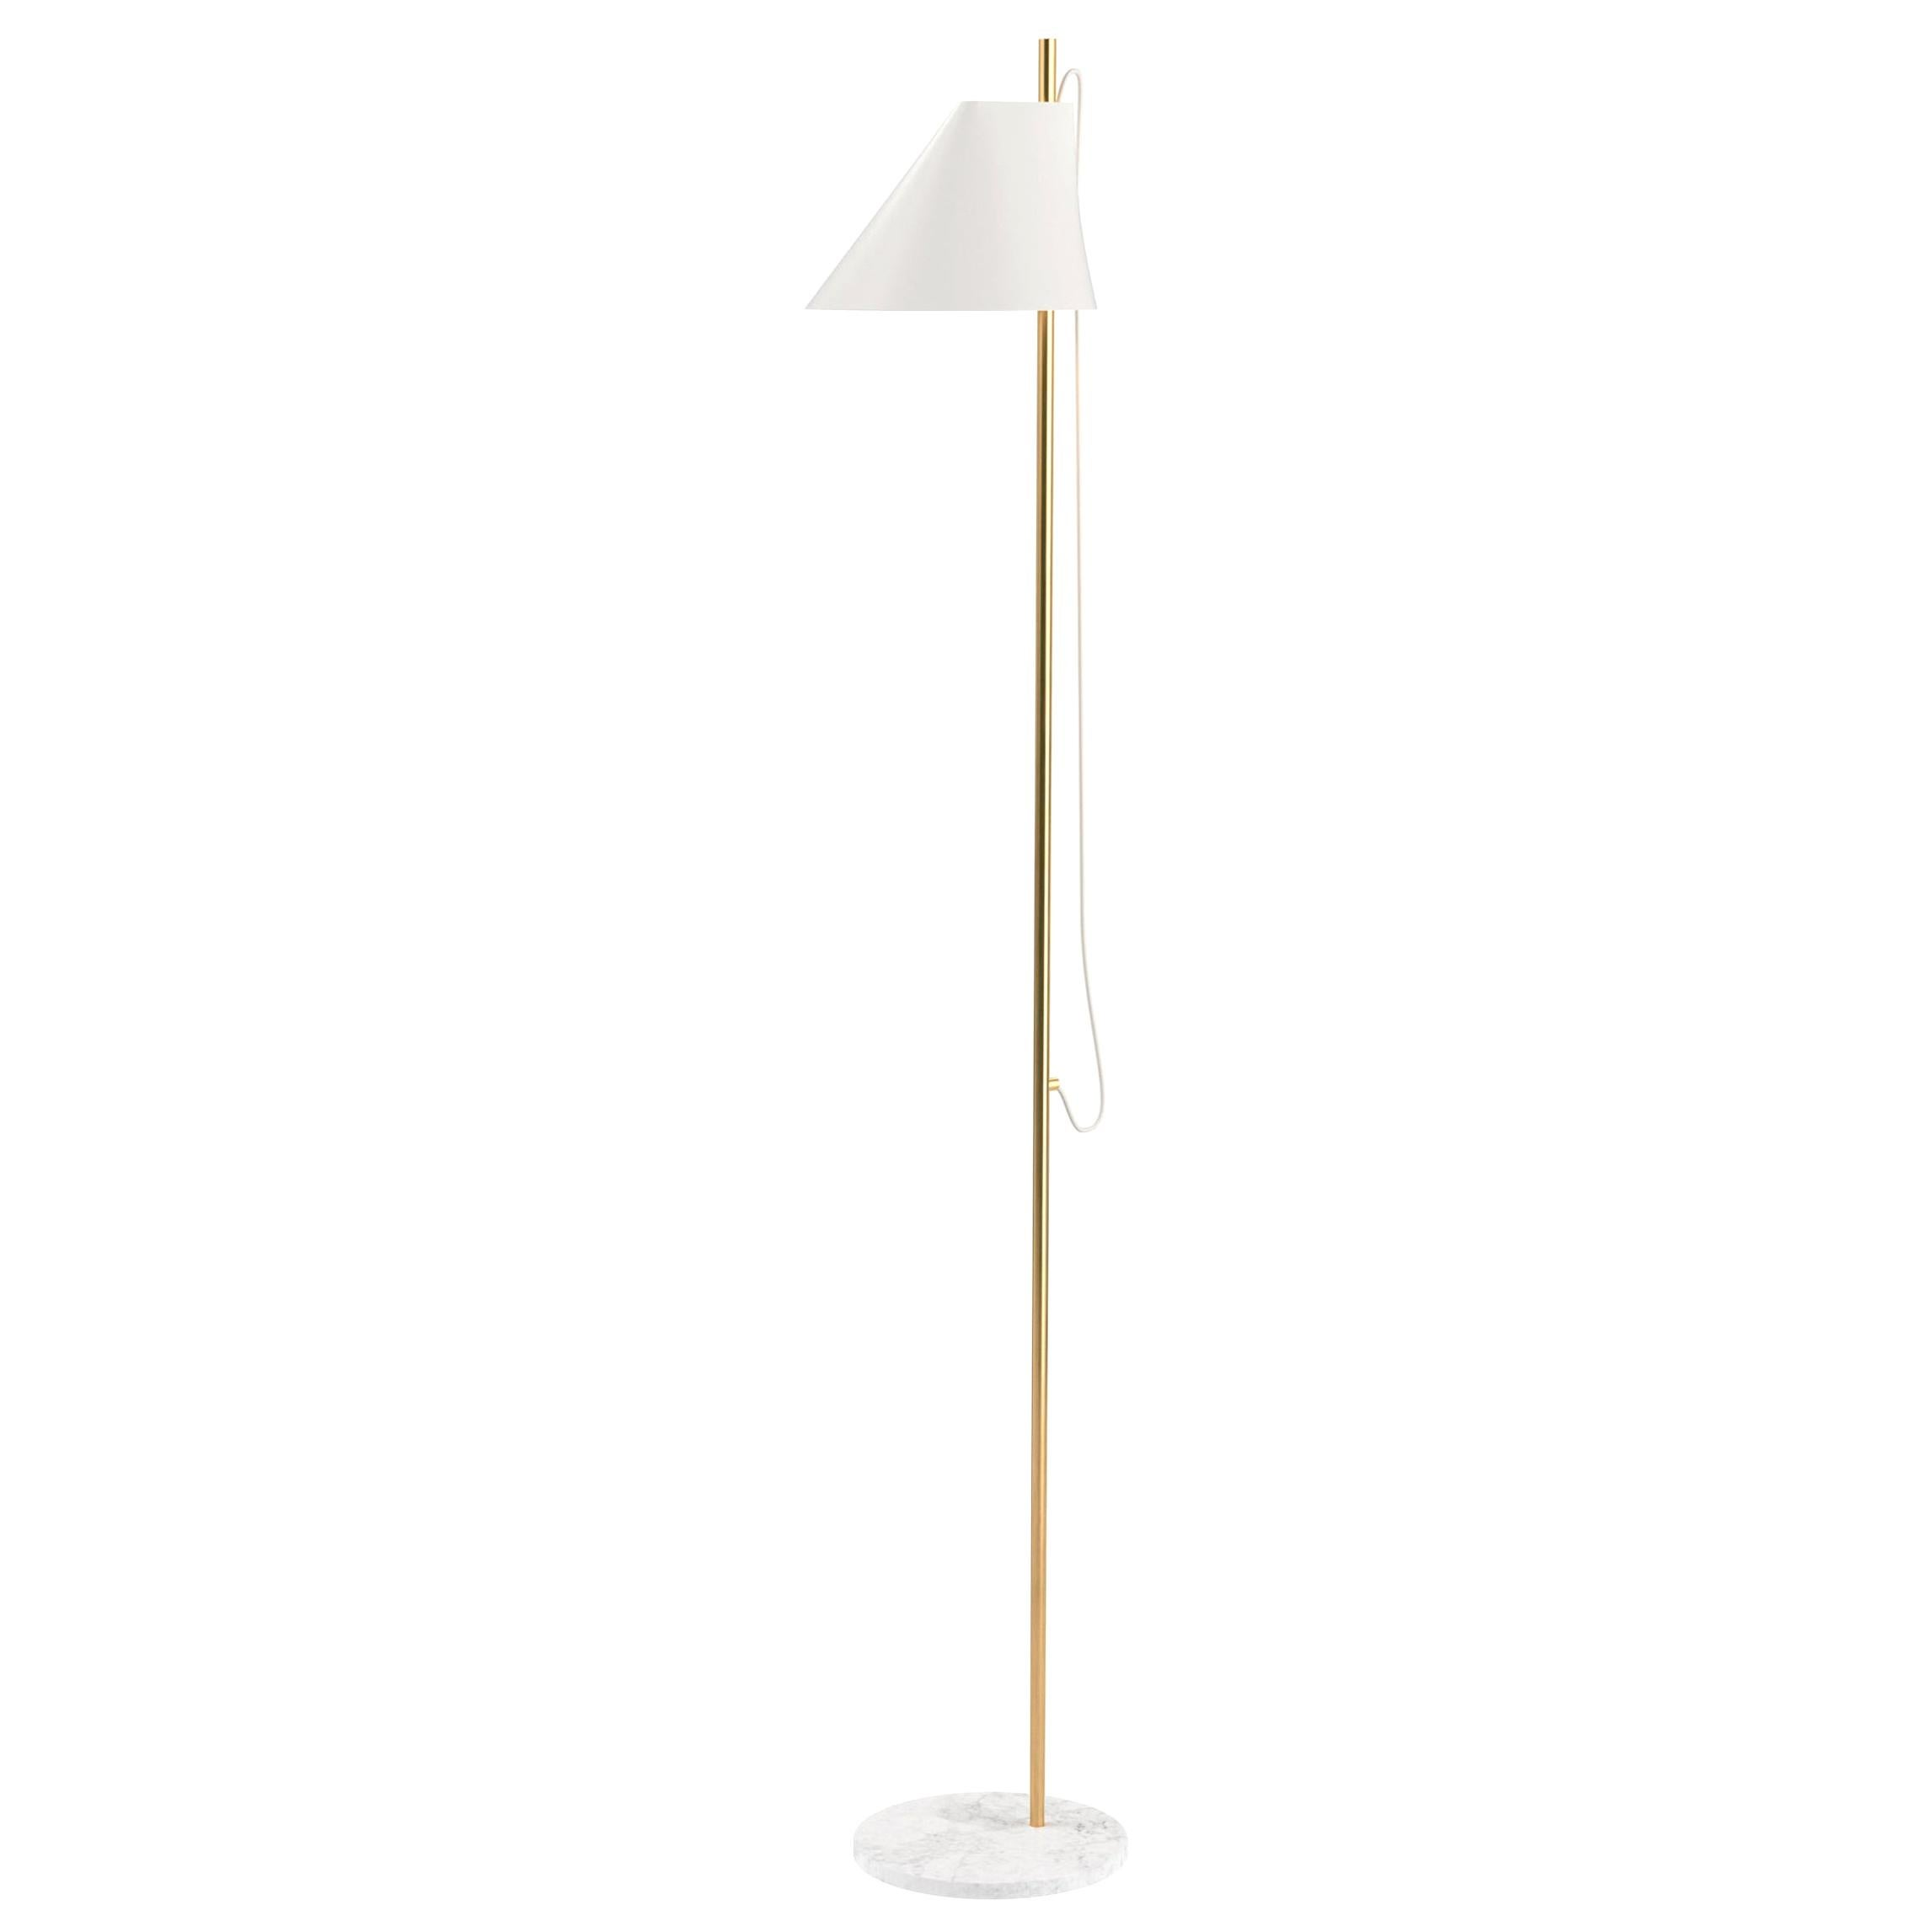 GamFratesi White 'YUH' Brass and Marble Floor Lamp for Louis Poulsen